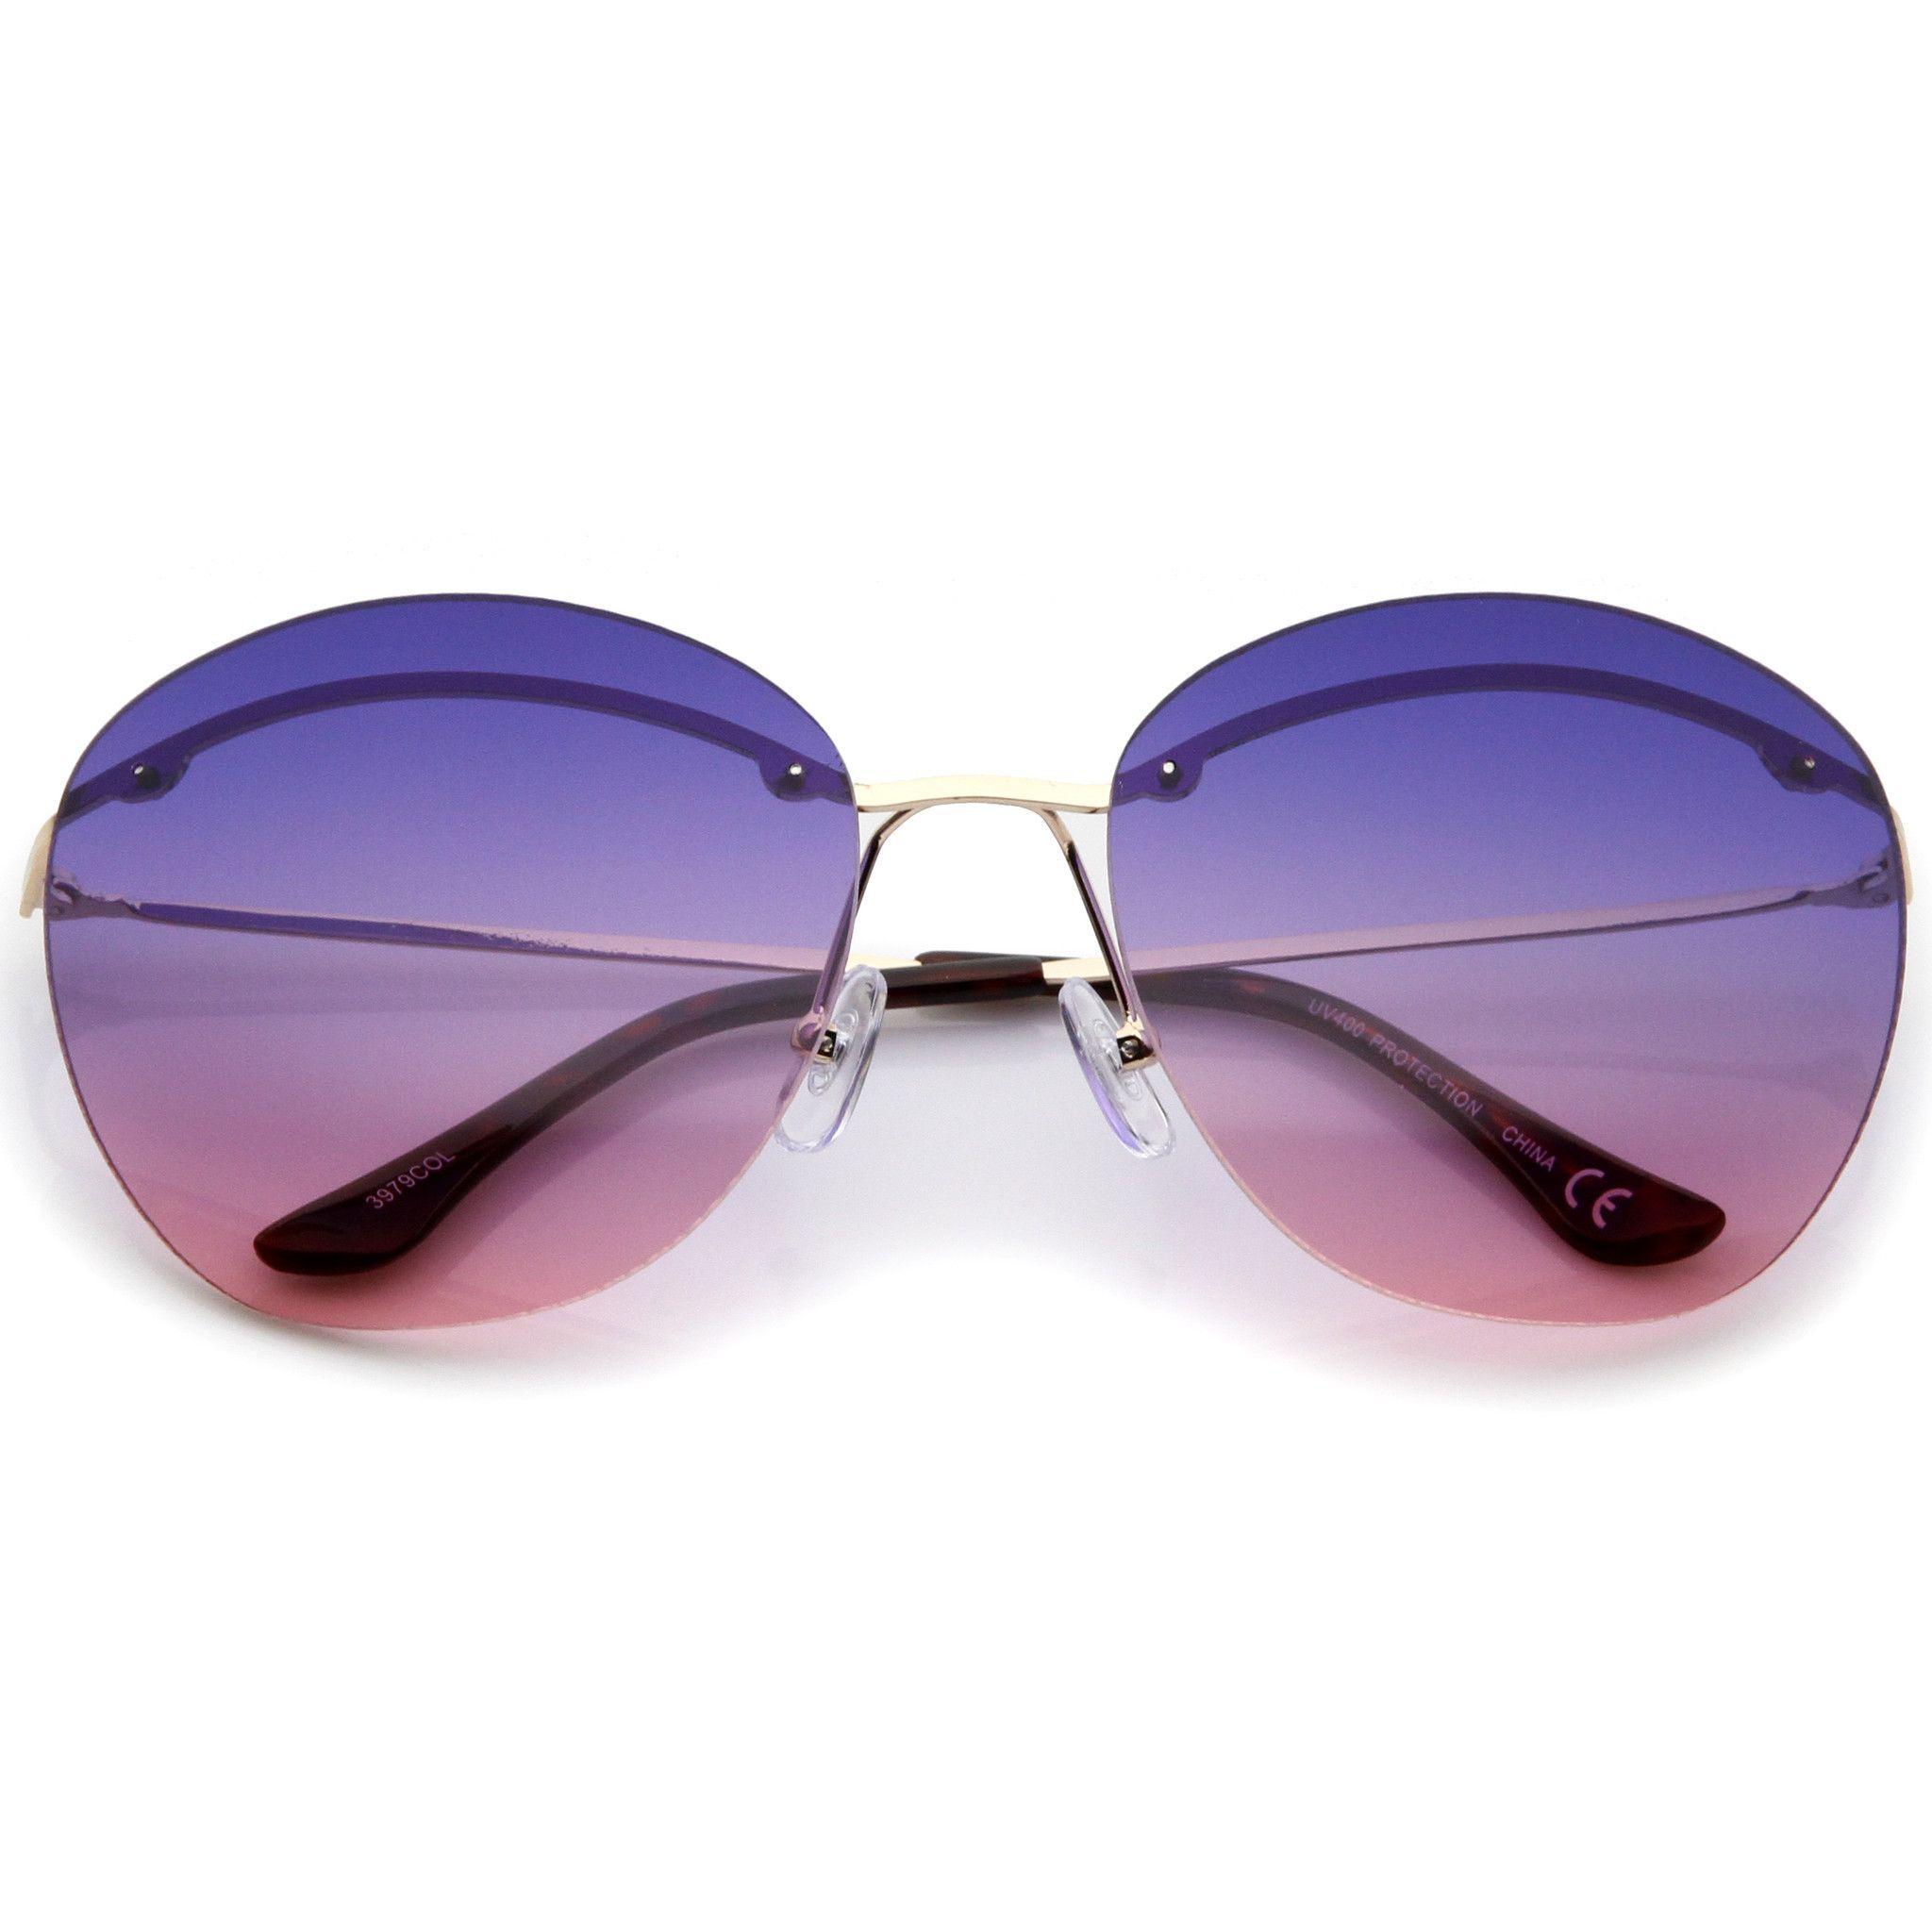 Retro Women's Brow A763 Round Lens Inner Sunglasses Gradient L35R4cAqj